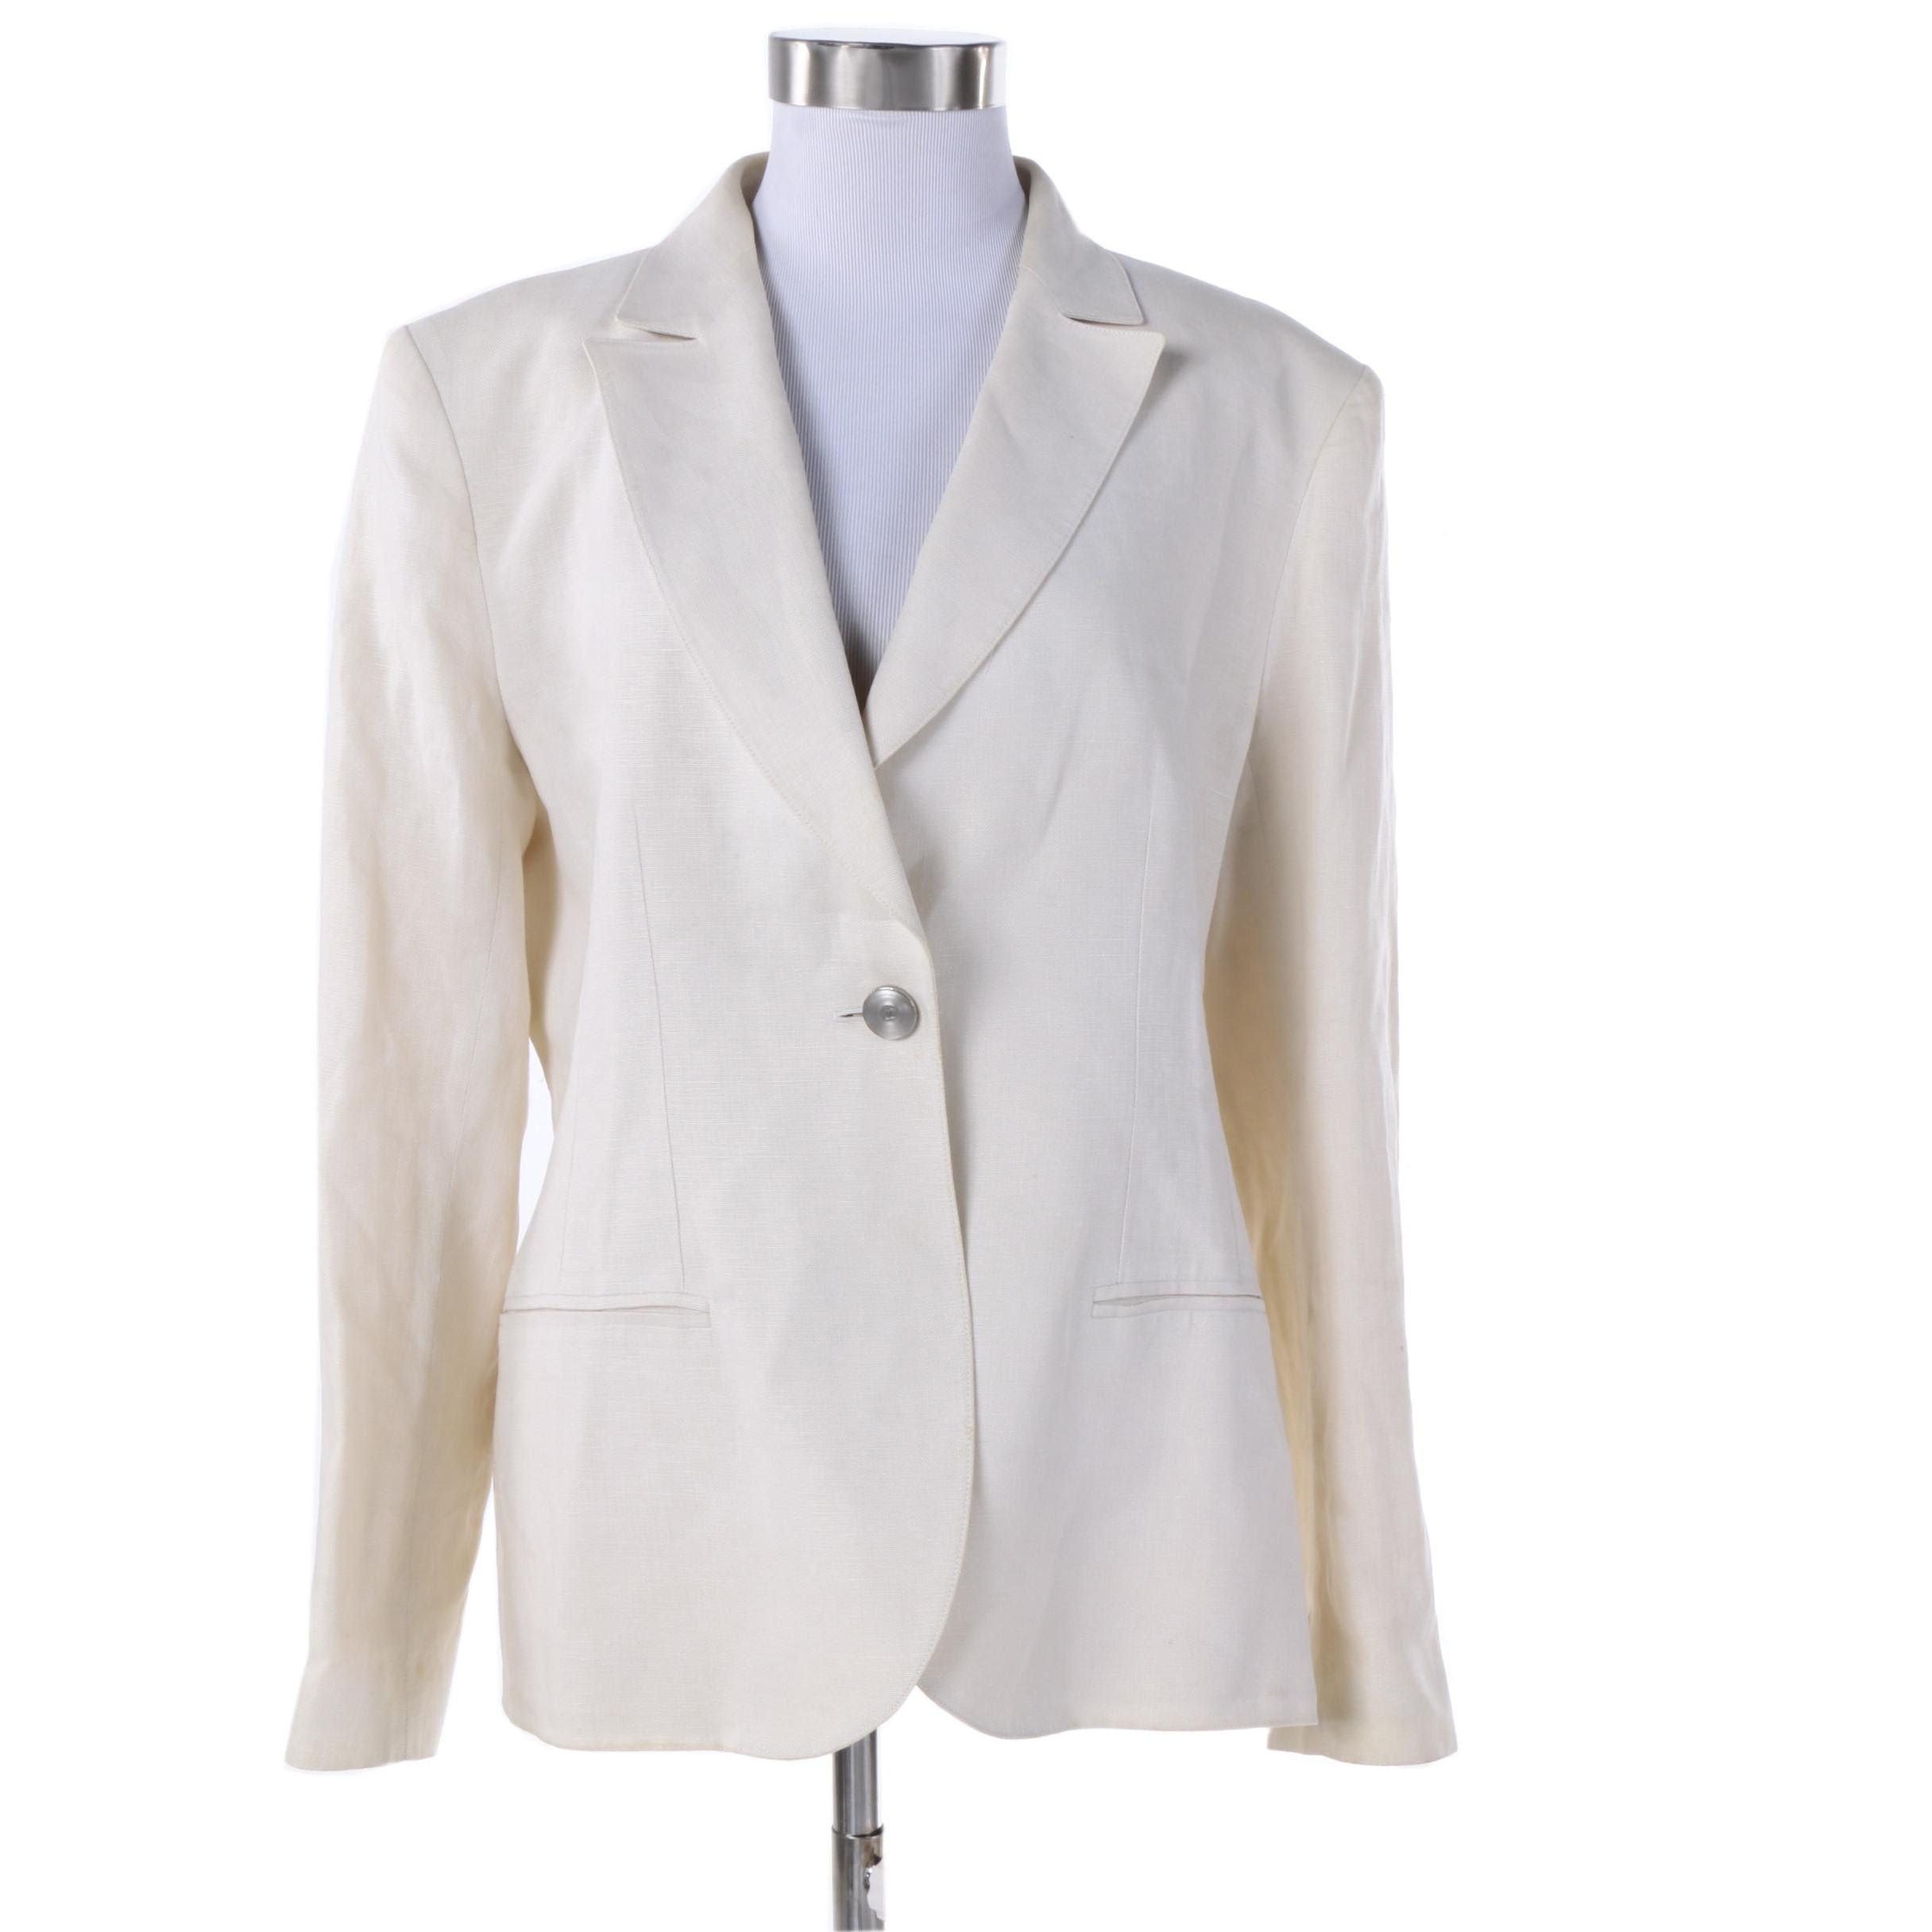 Women's Chanel Boutique Linen Blazer